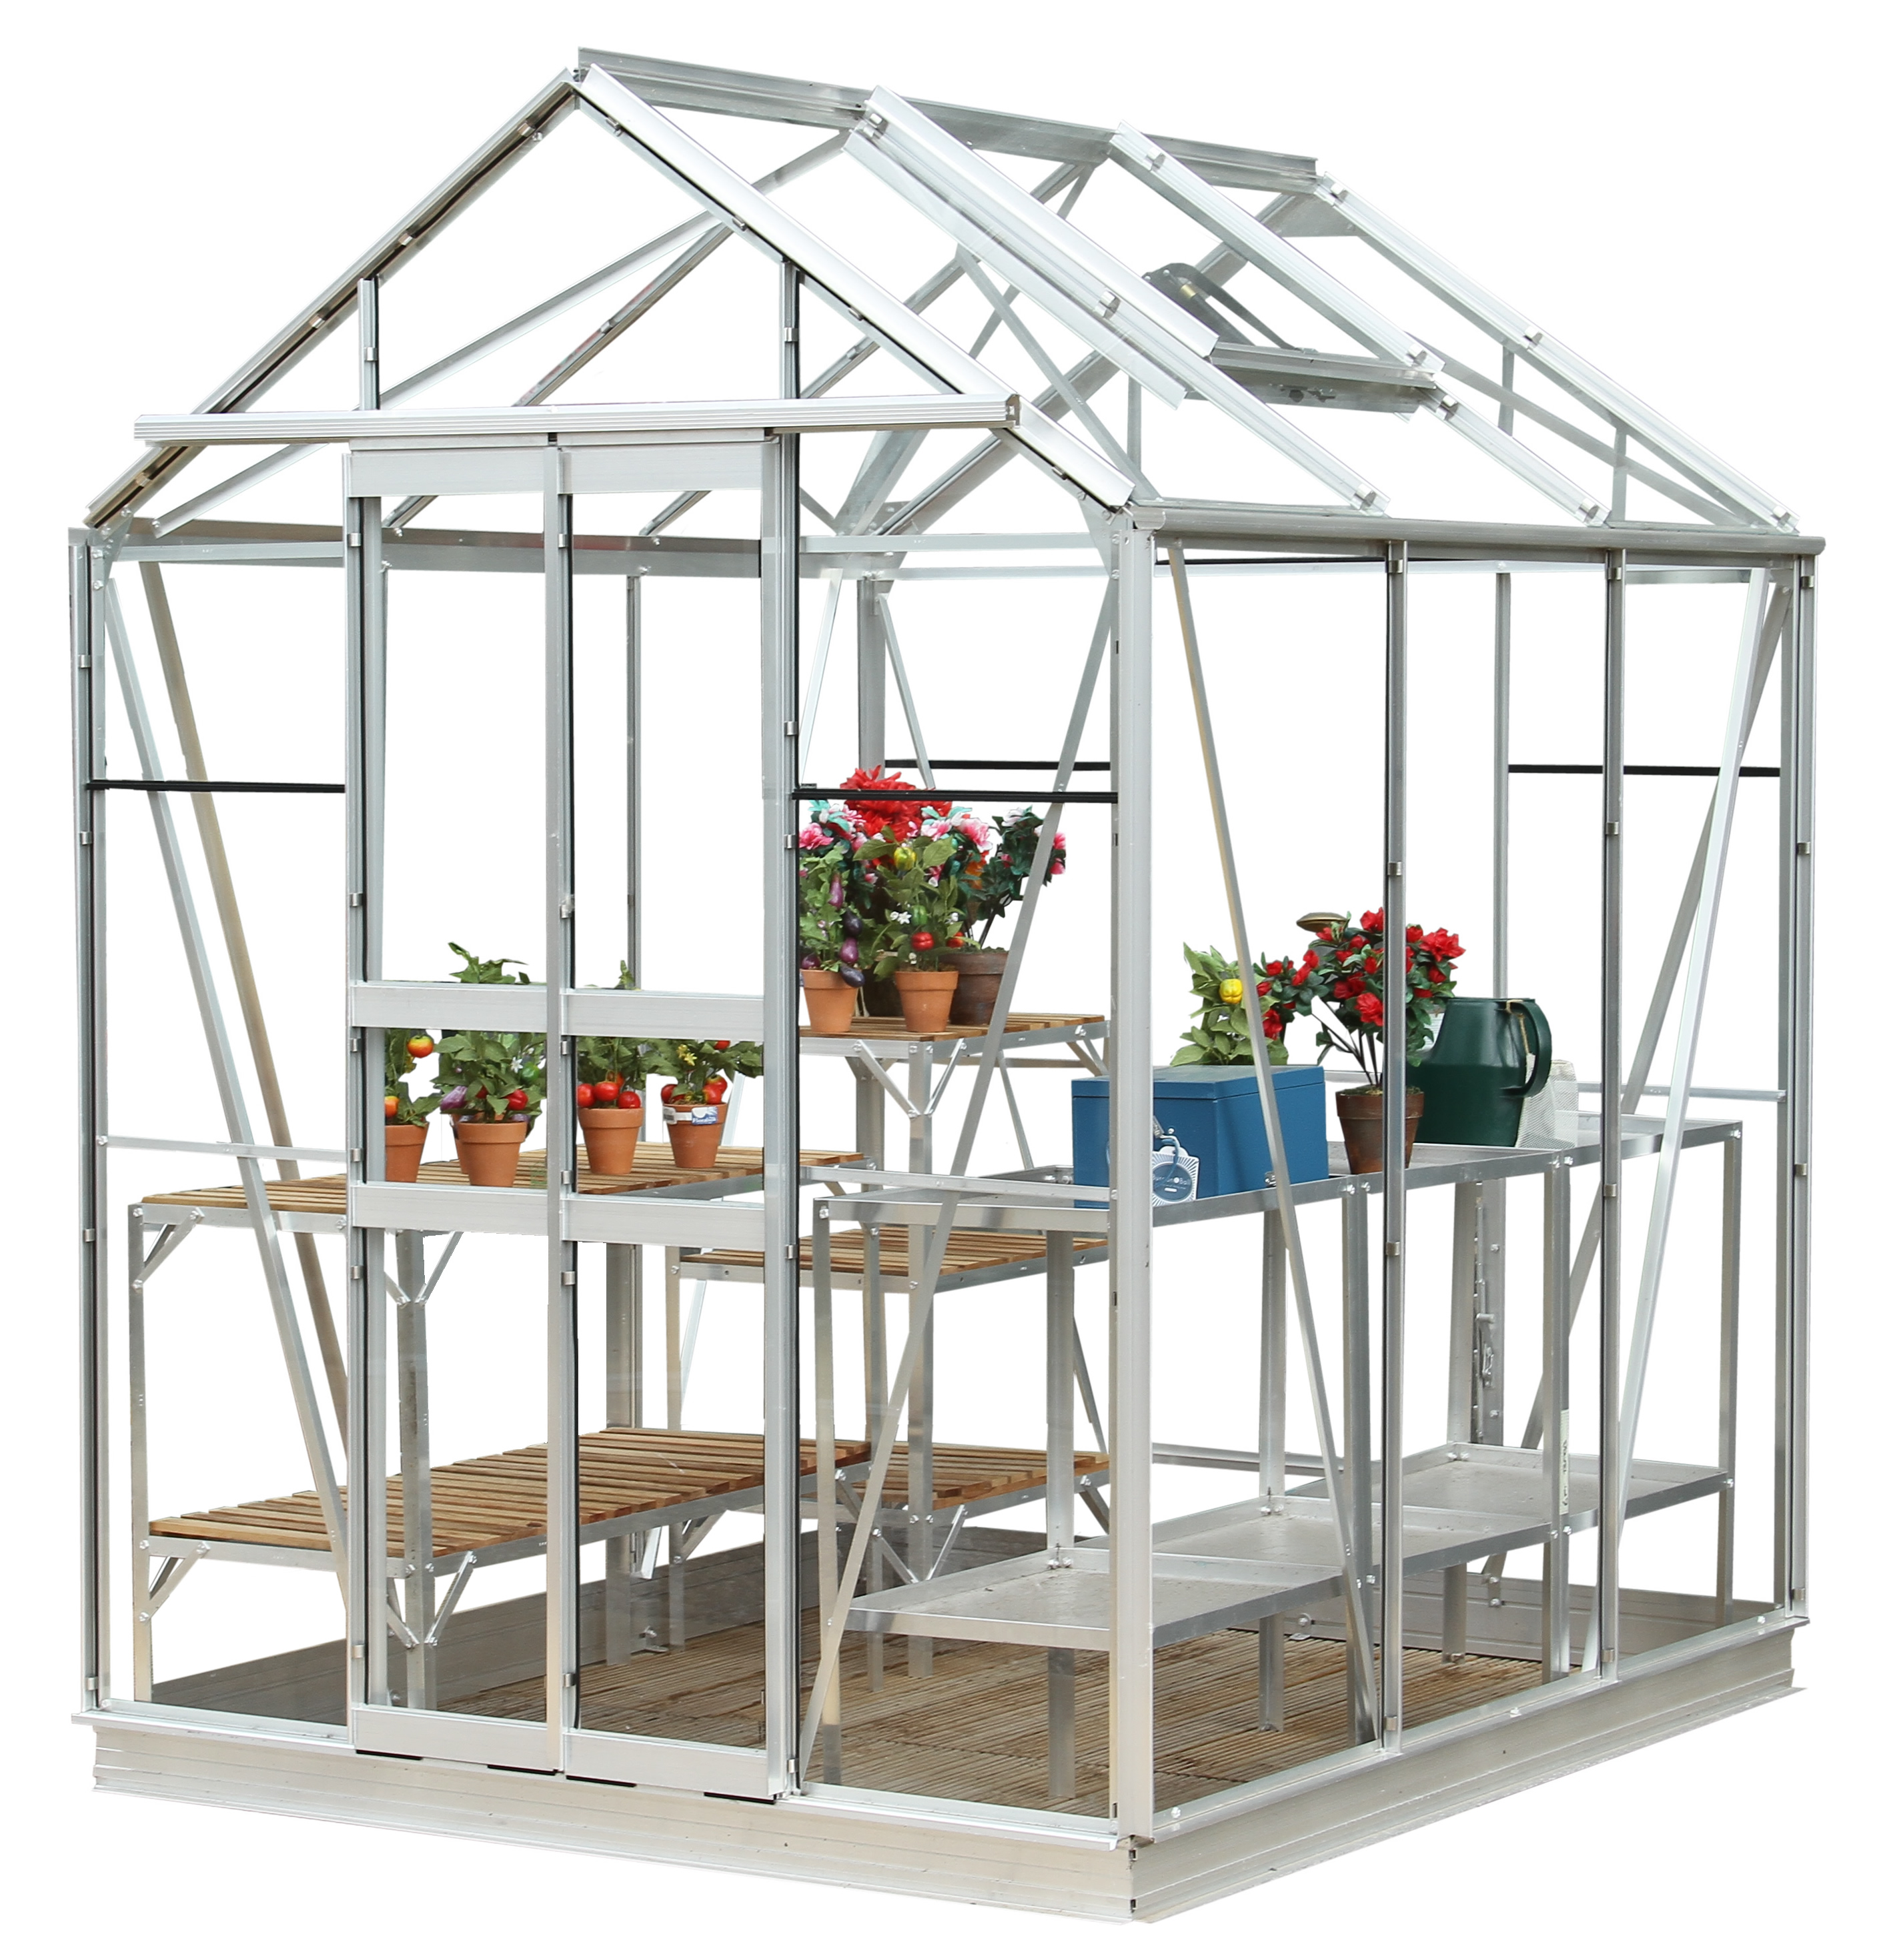 Simplicity Stafford Plain Aluminium Greenhouse 5x6 Starter Package